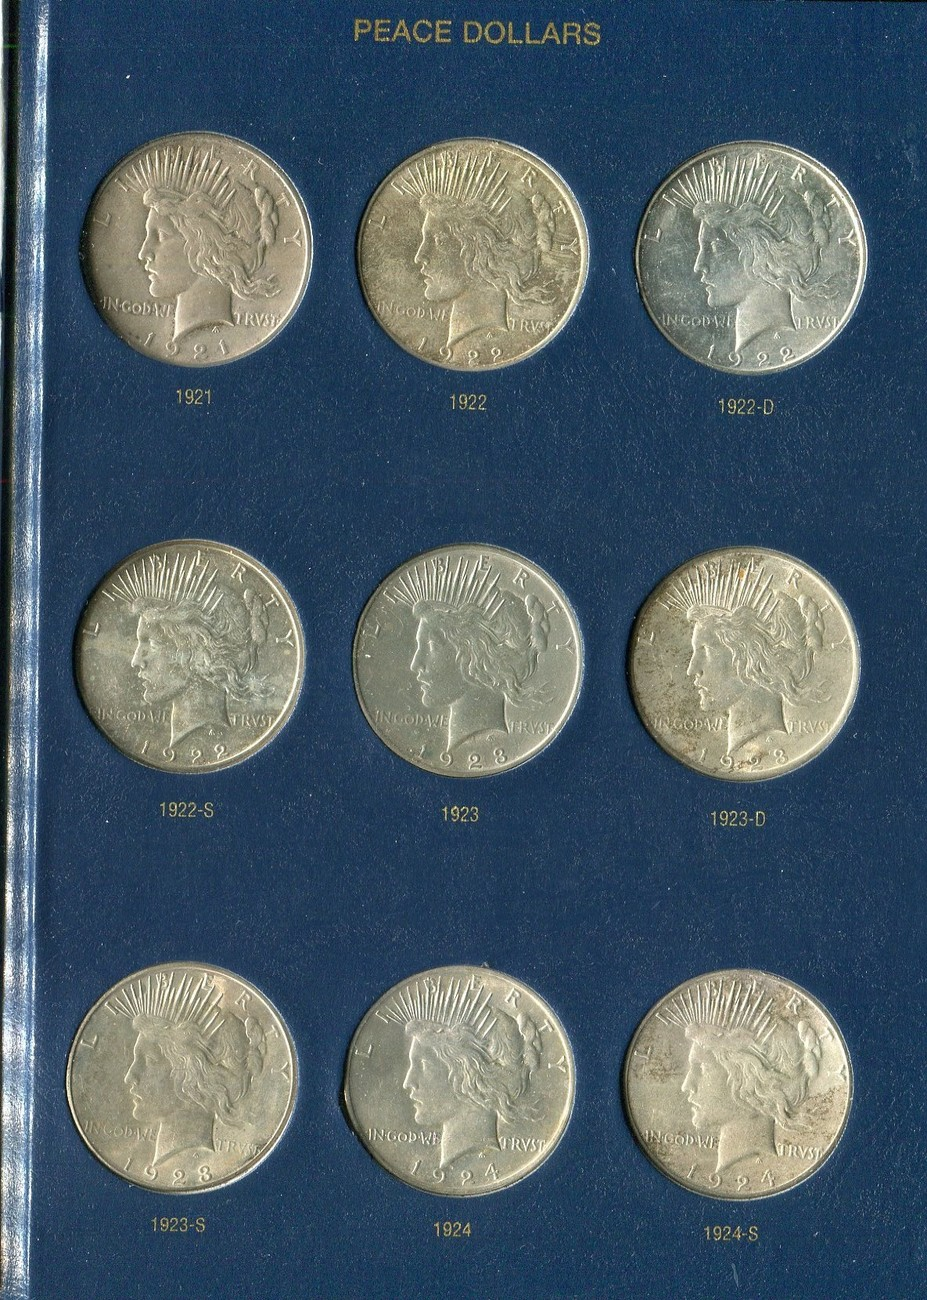 24 x 1 Dollar 1921 - 1935 USA Peace Dollars Komplettsatz - hübsche Sammlung  Lot see picture